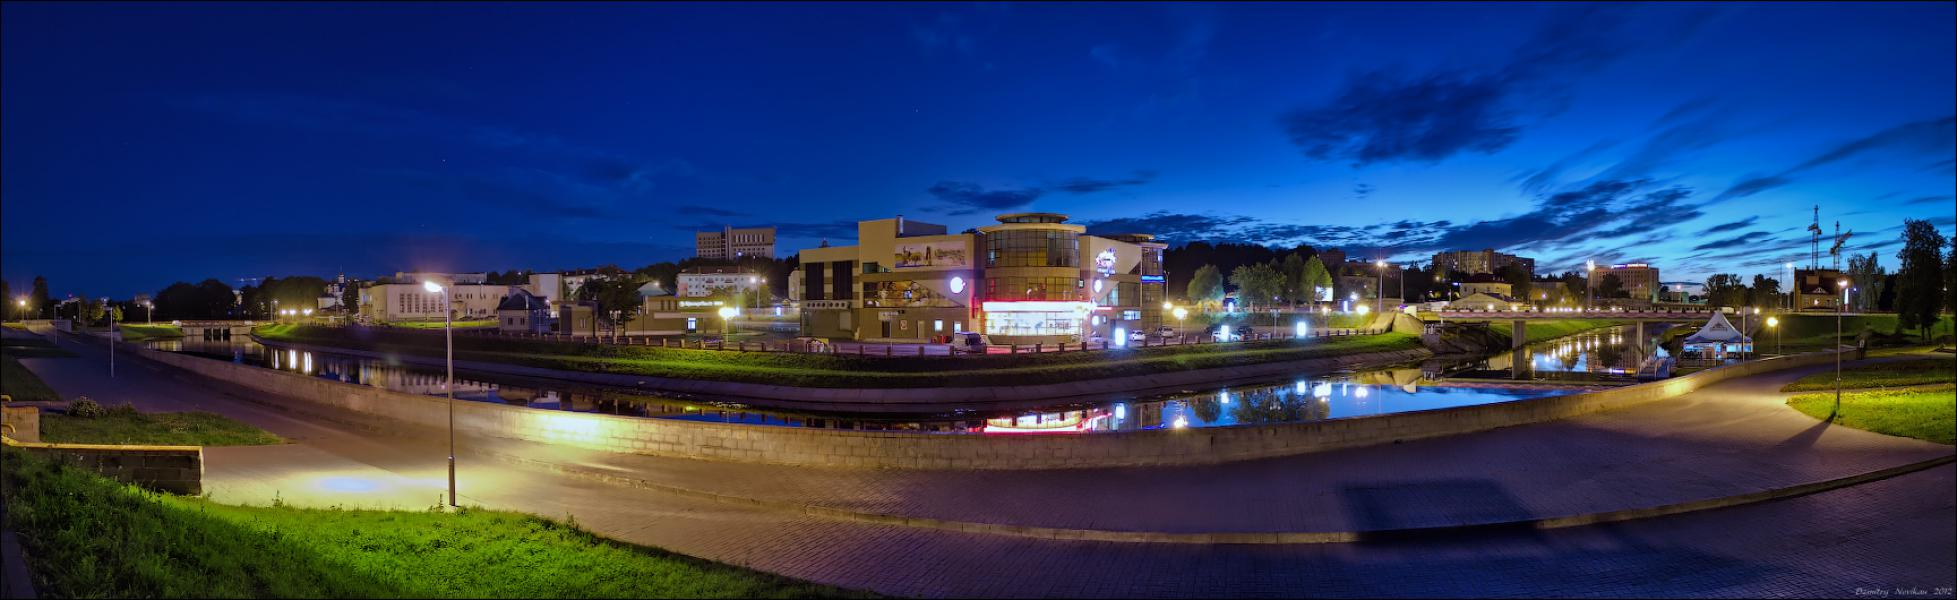 Вечерняя панорама Орша